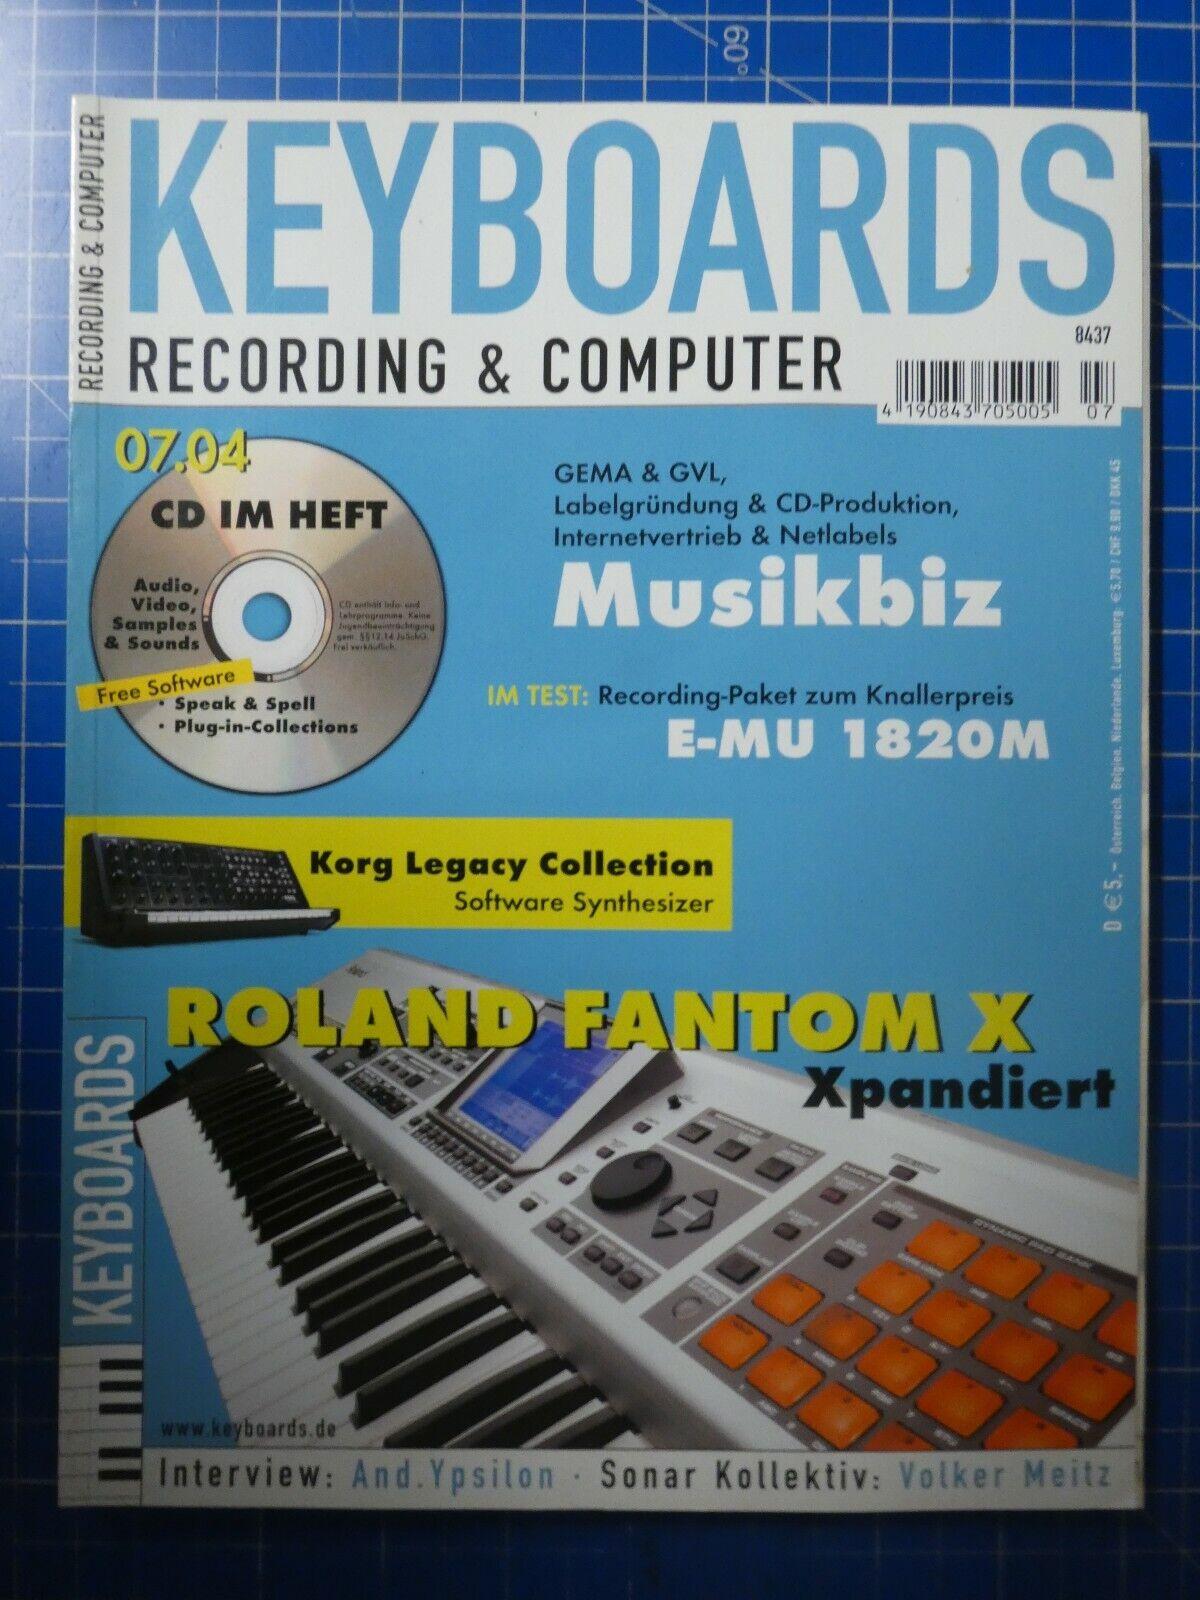 Keyboards Recording&Computer Juli 2004 Roland Fantom X Volker Meitz To624